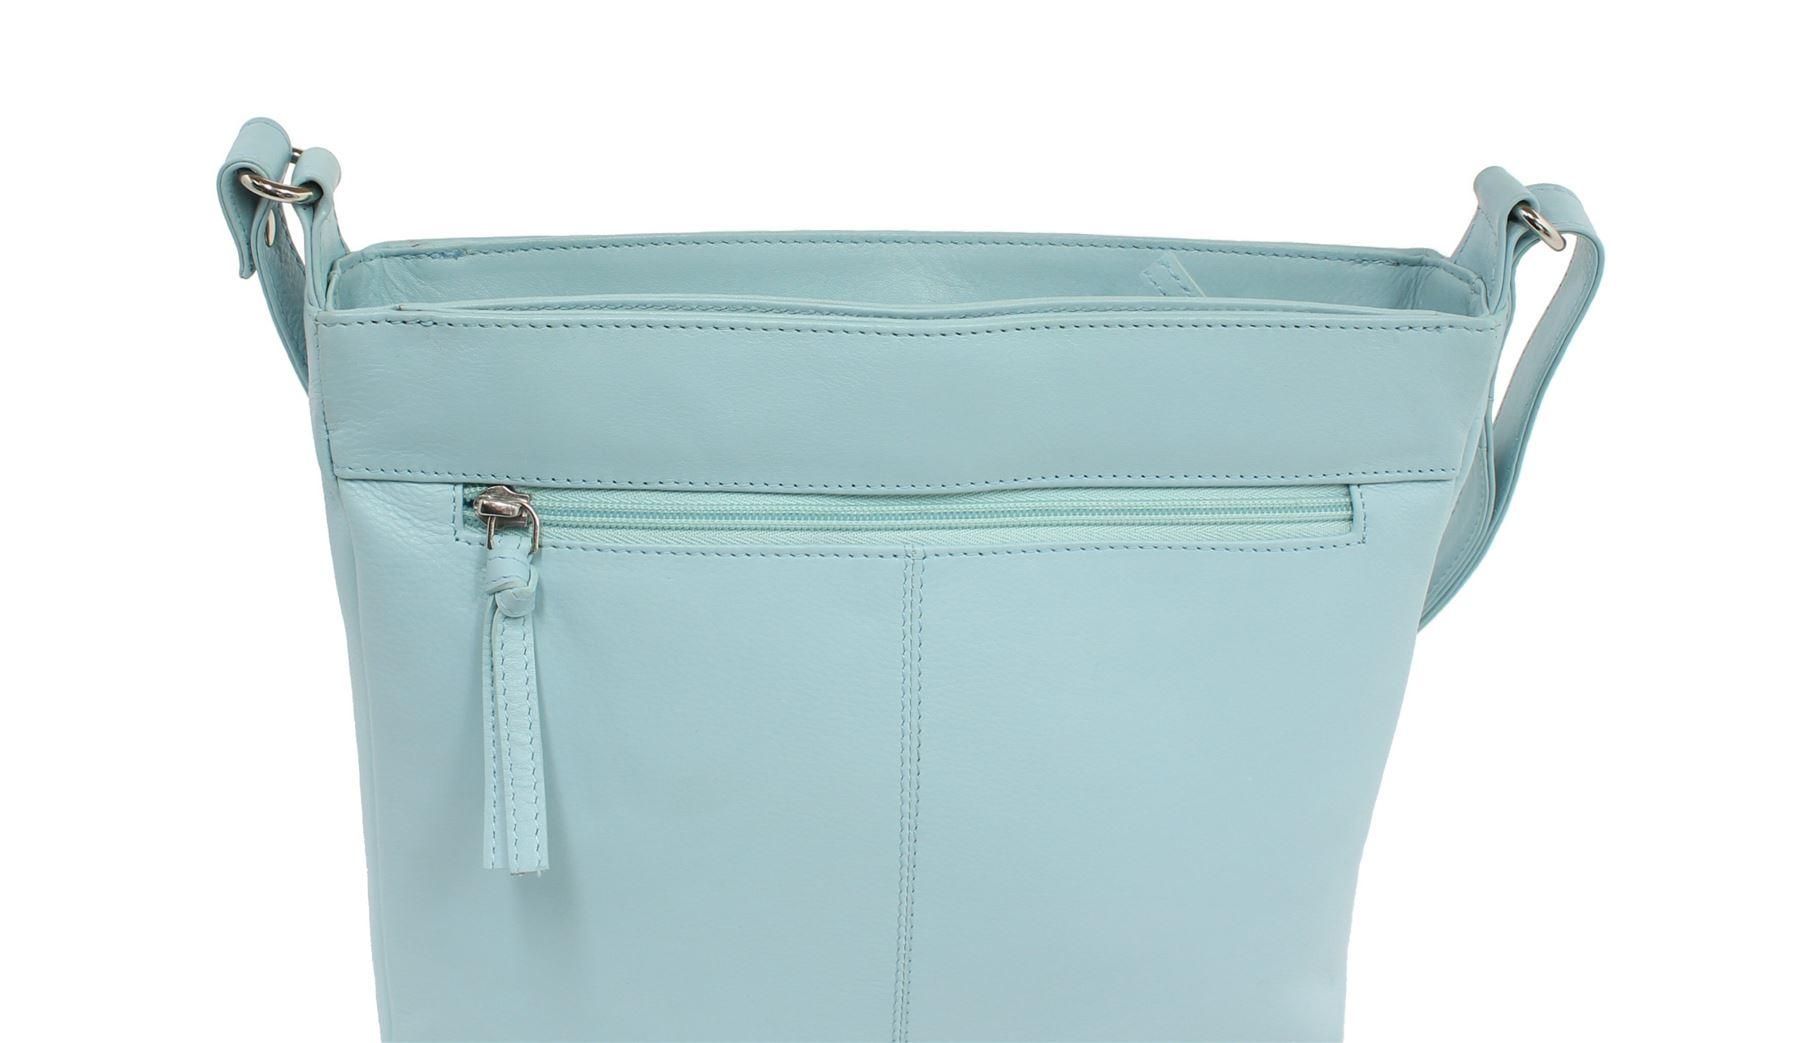 Blu tracolla Collection 12 spalla Time 7130 For Borsa Leather Tea Mala a A86nPqw